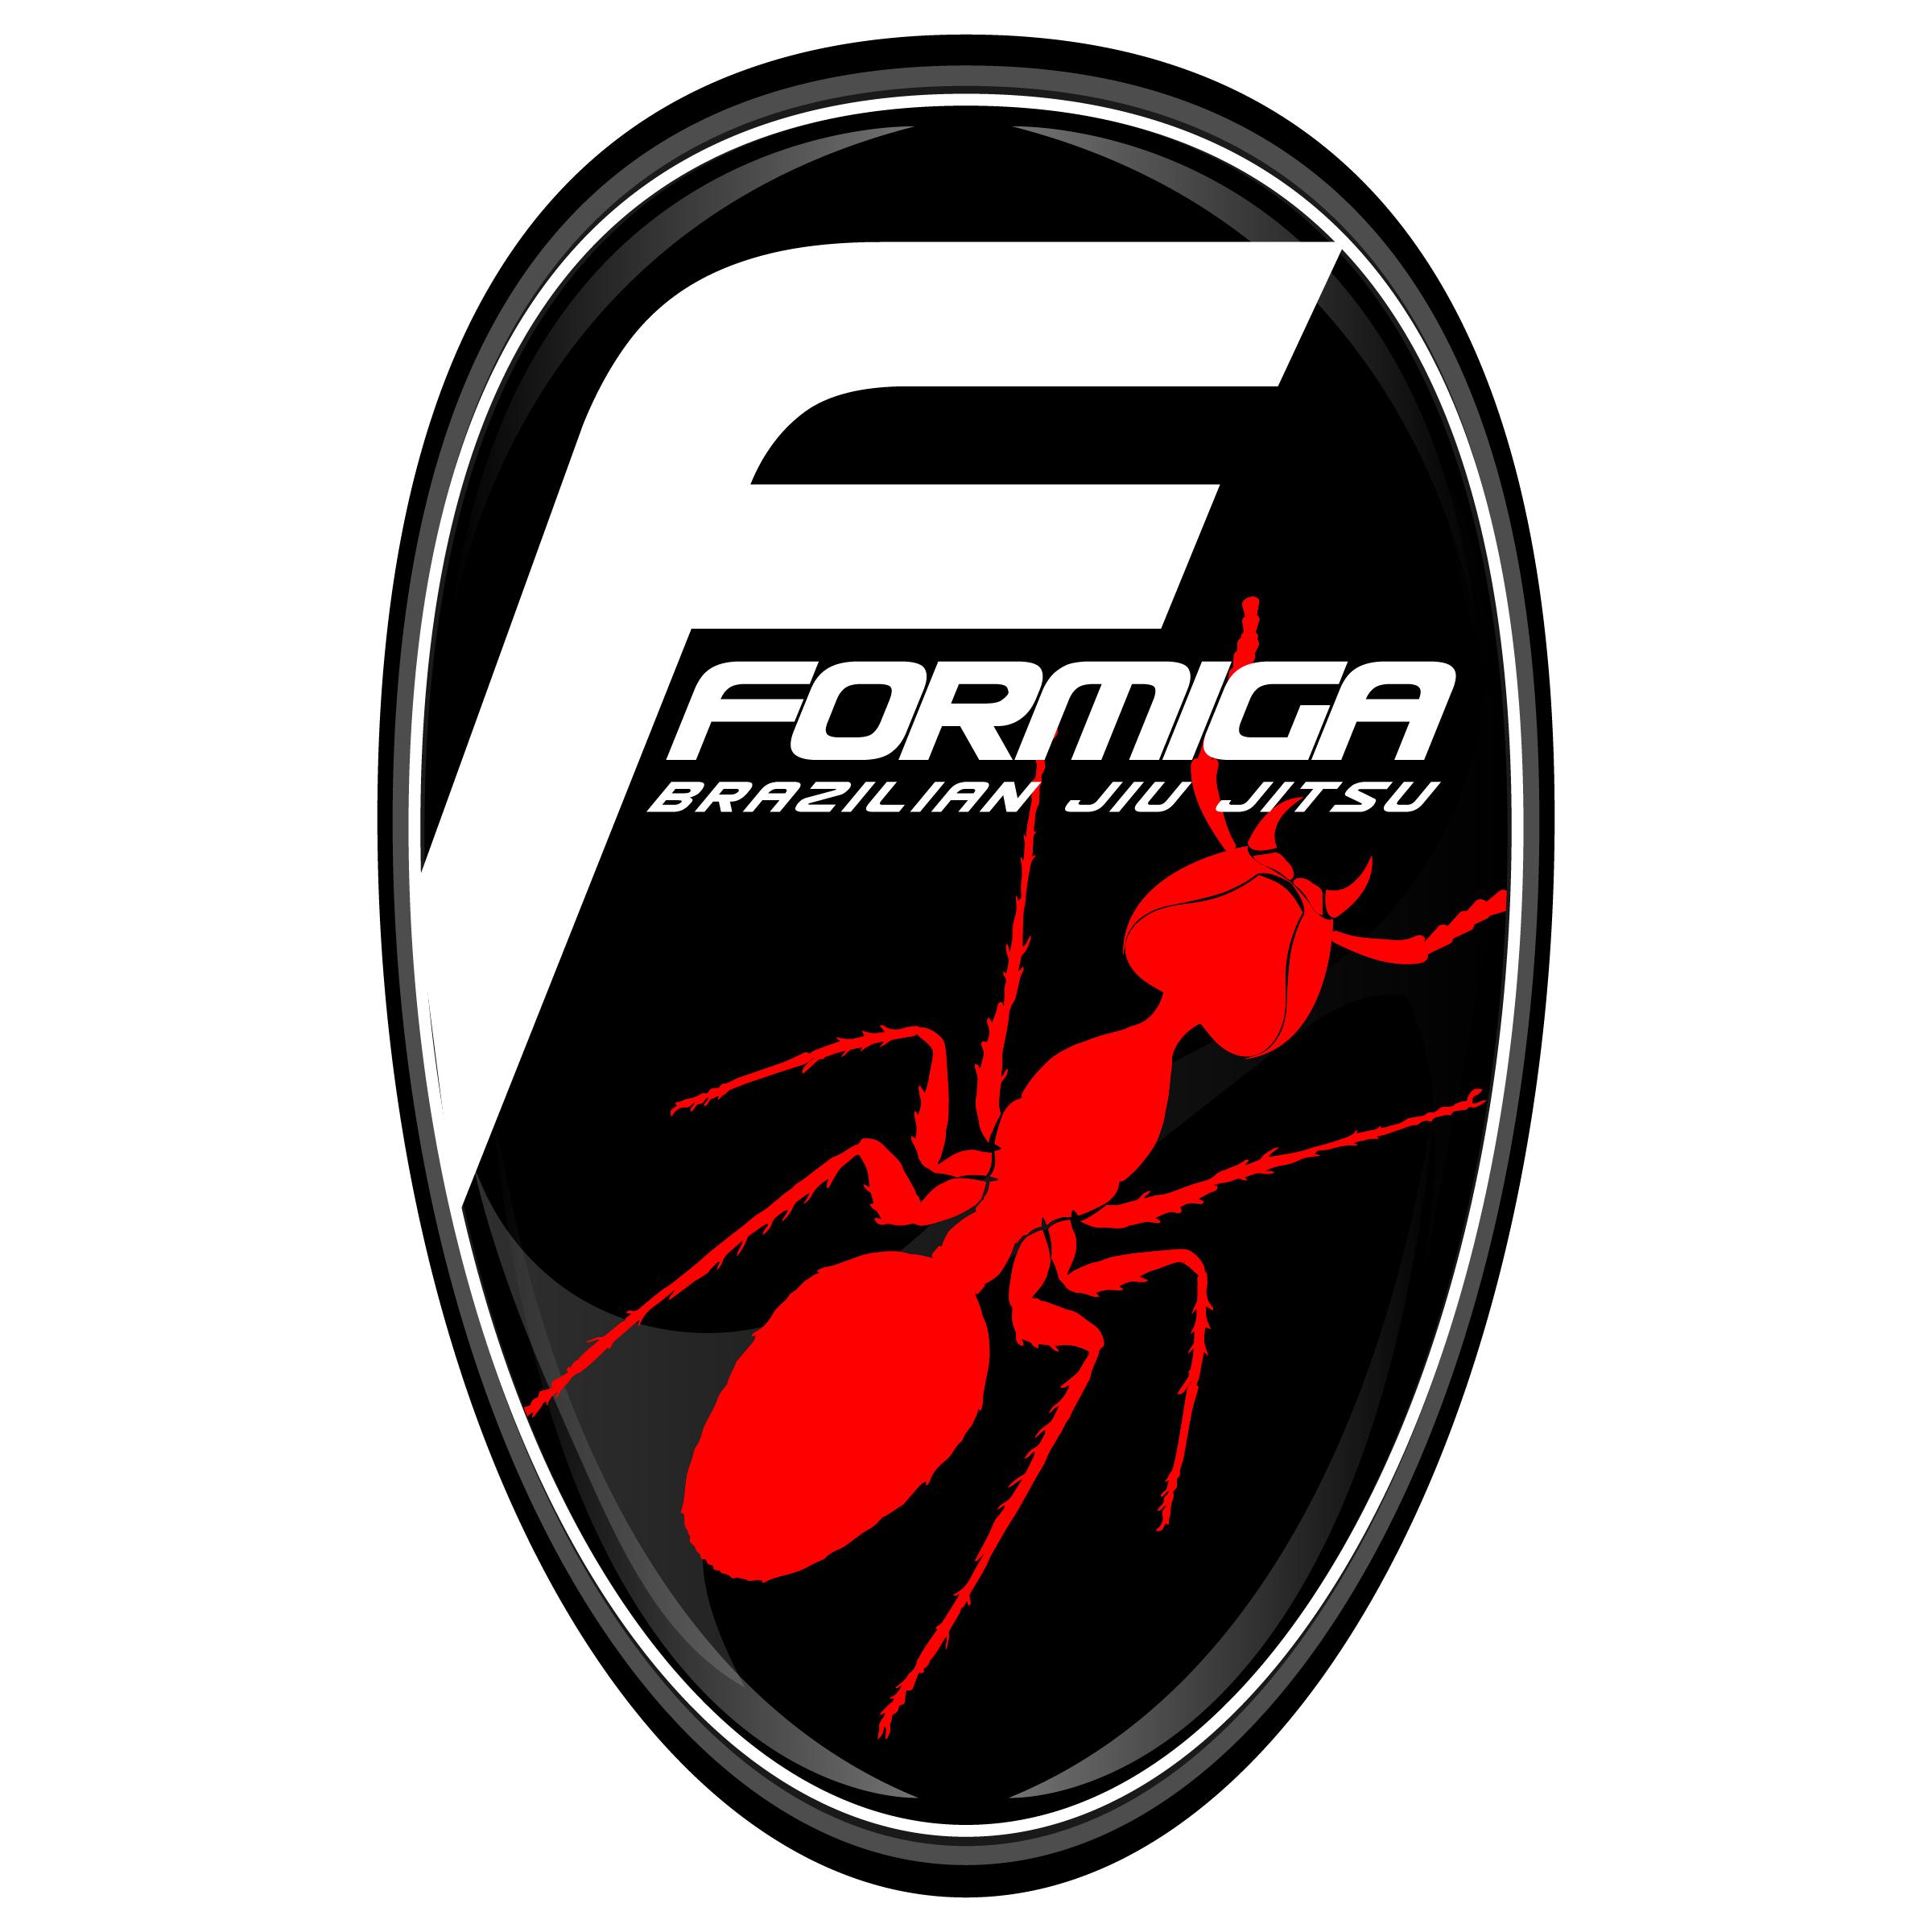 8x8-Formiga-01.jpg